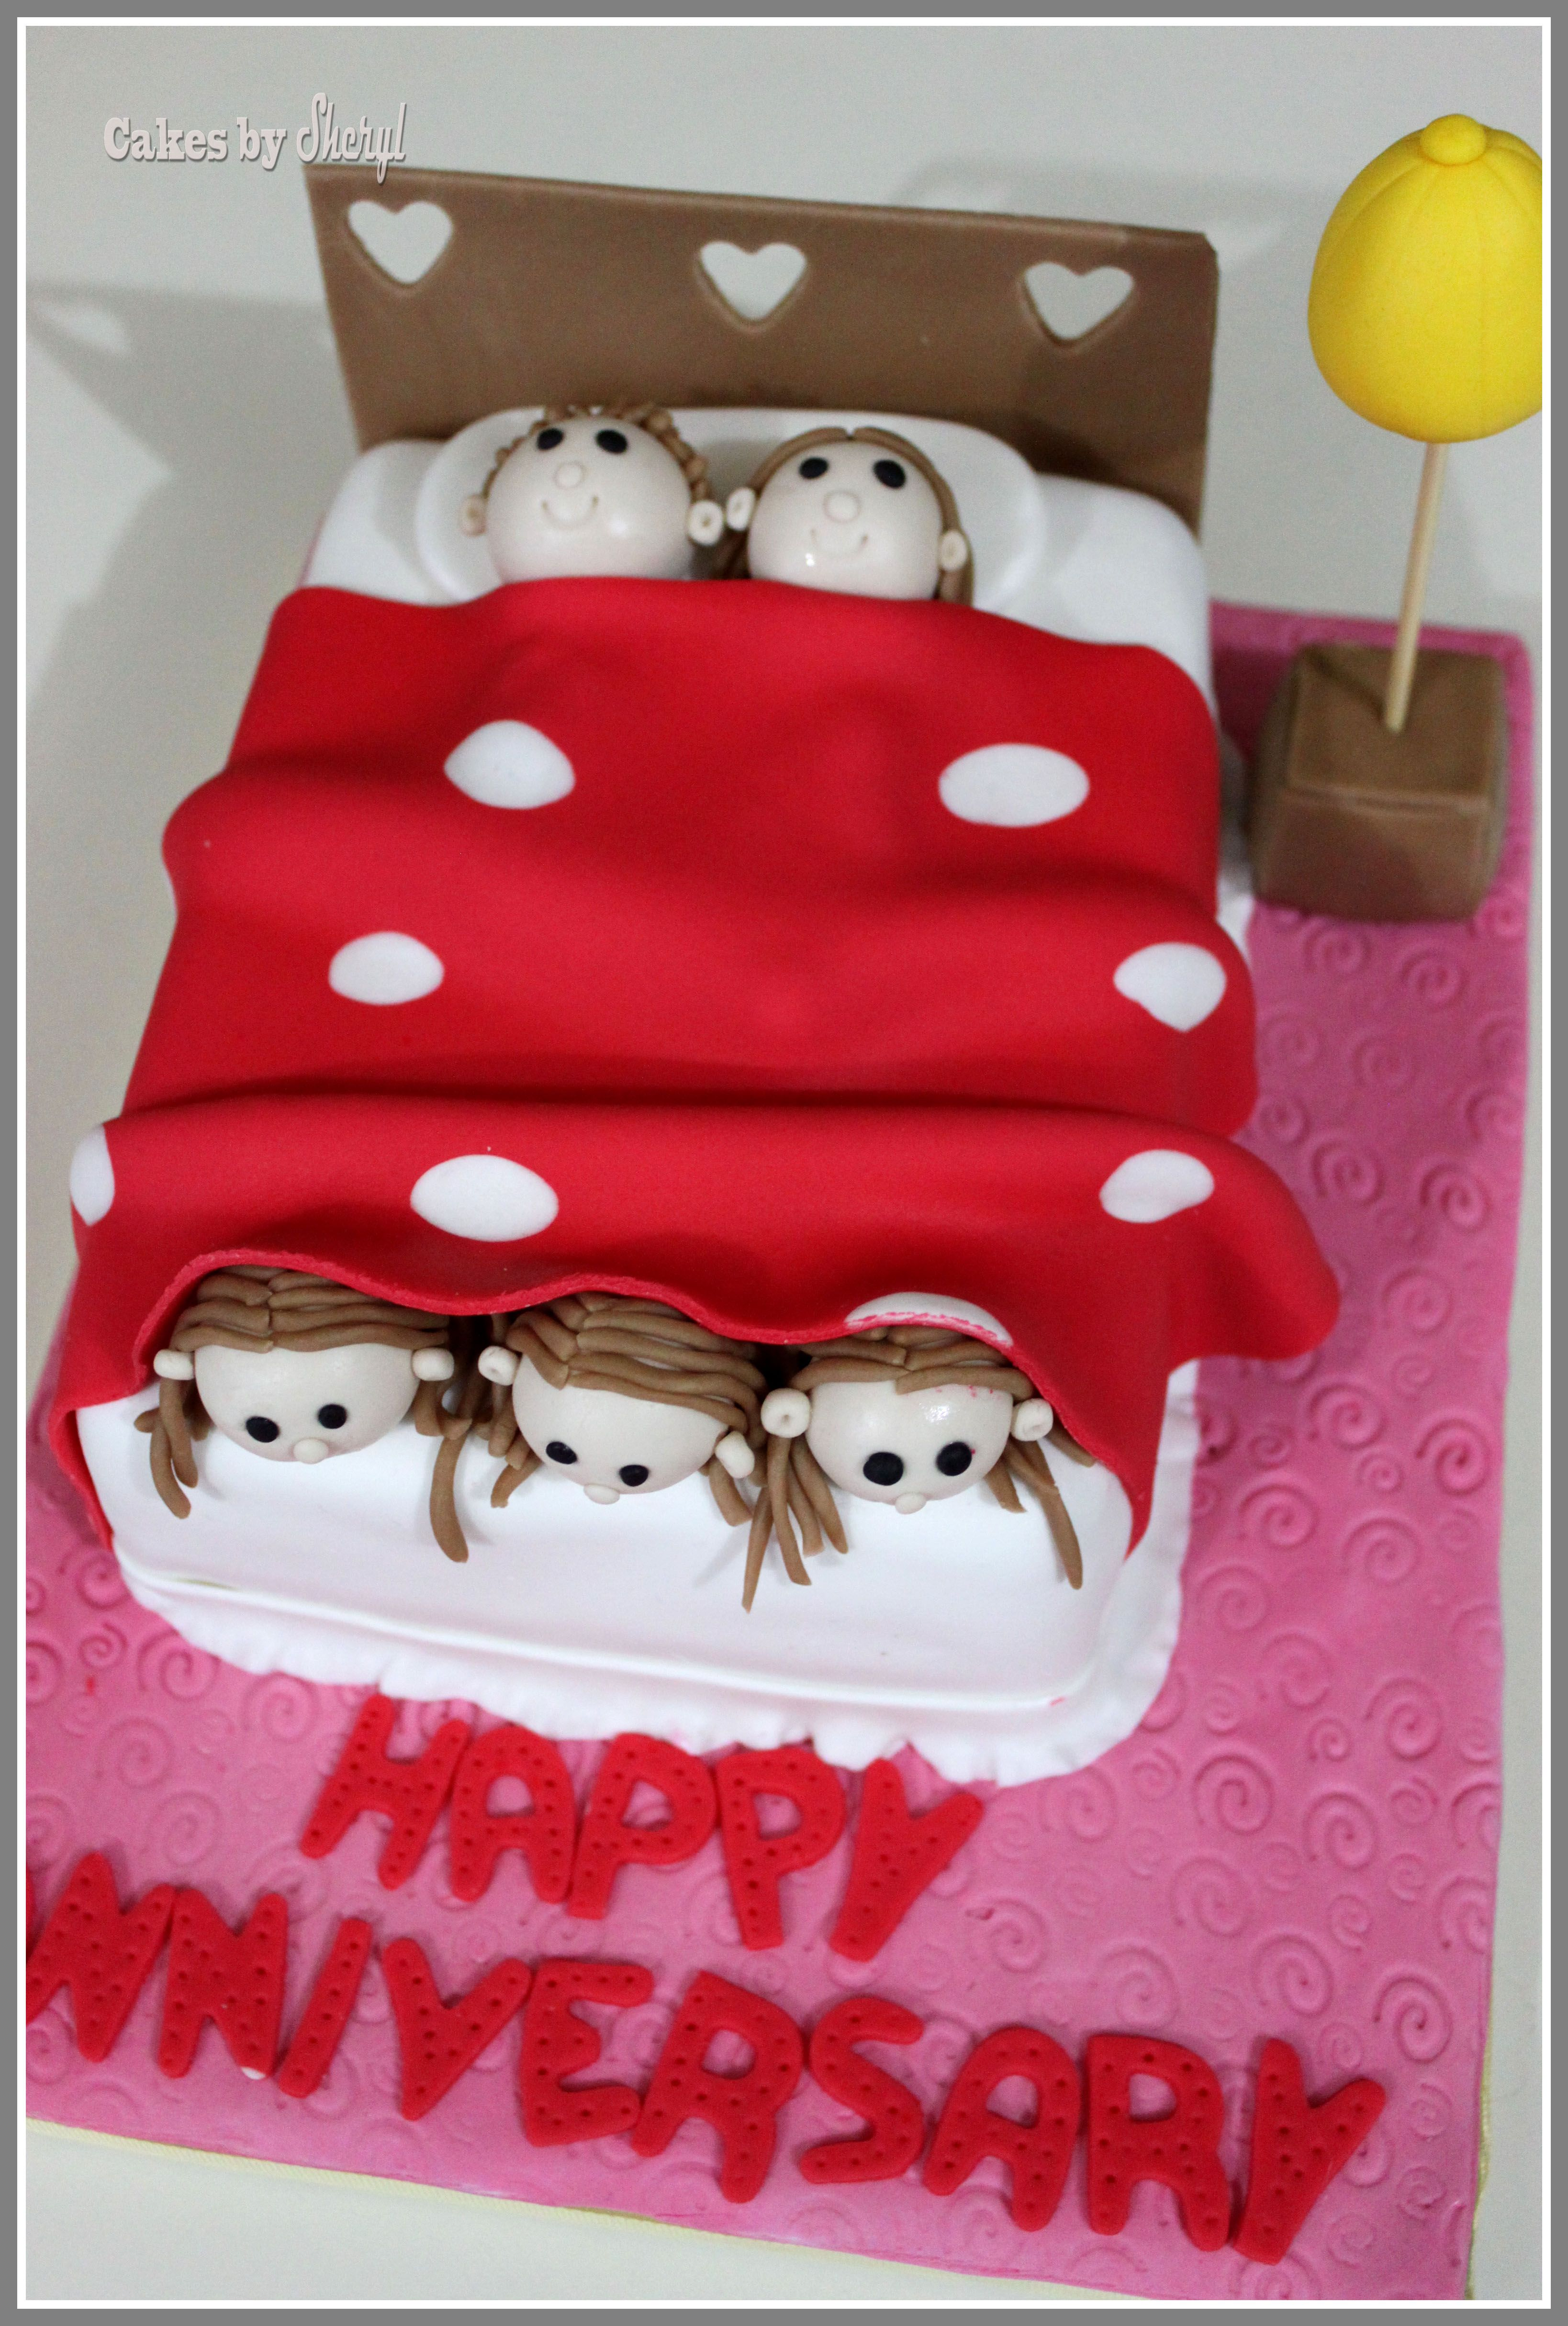 Funny Wedding Anniversary Cake Cakes By Sheryl Pinterest